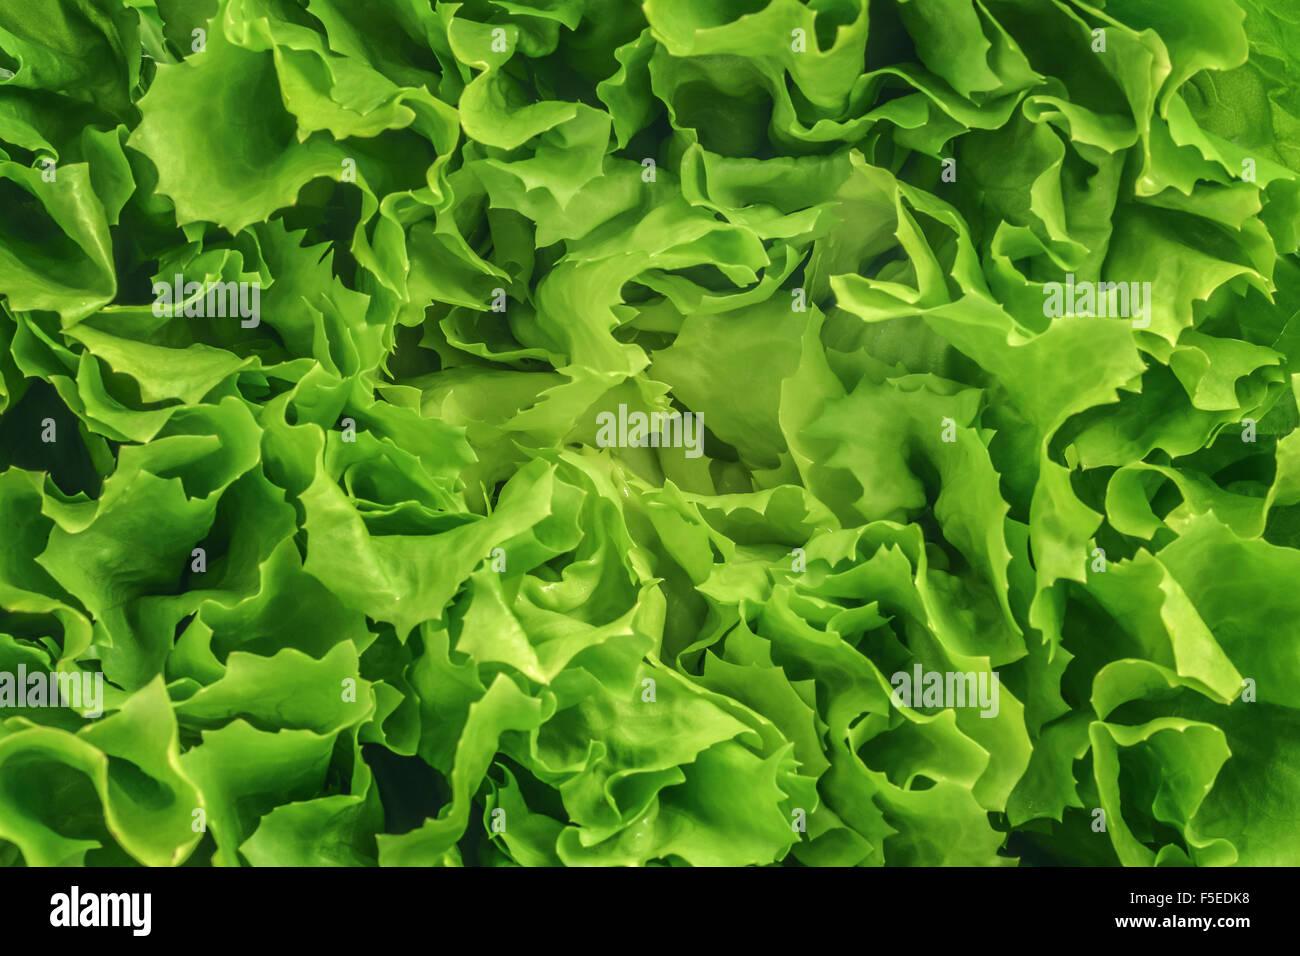 raw lettuce salad background texture - Stock Image